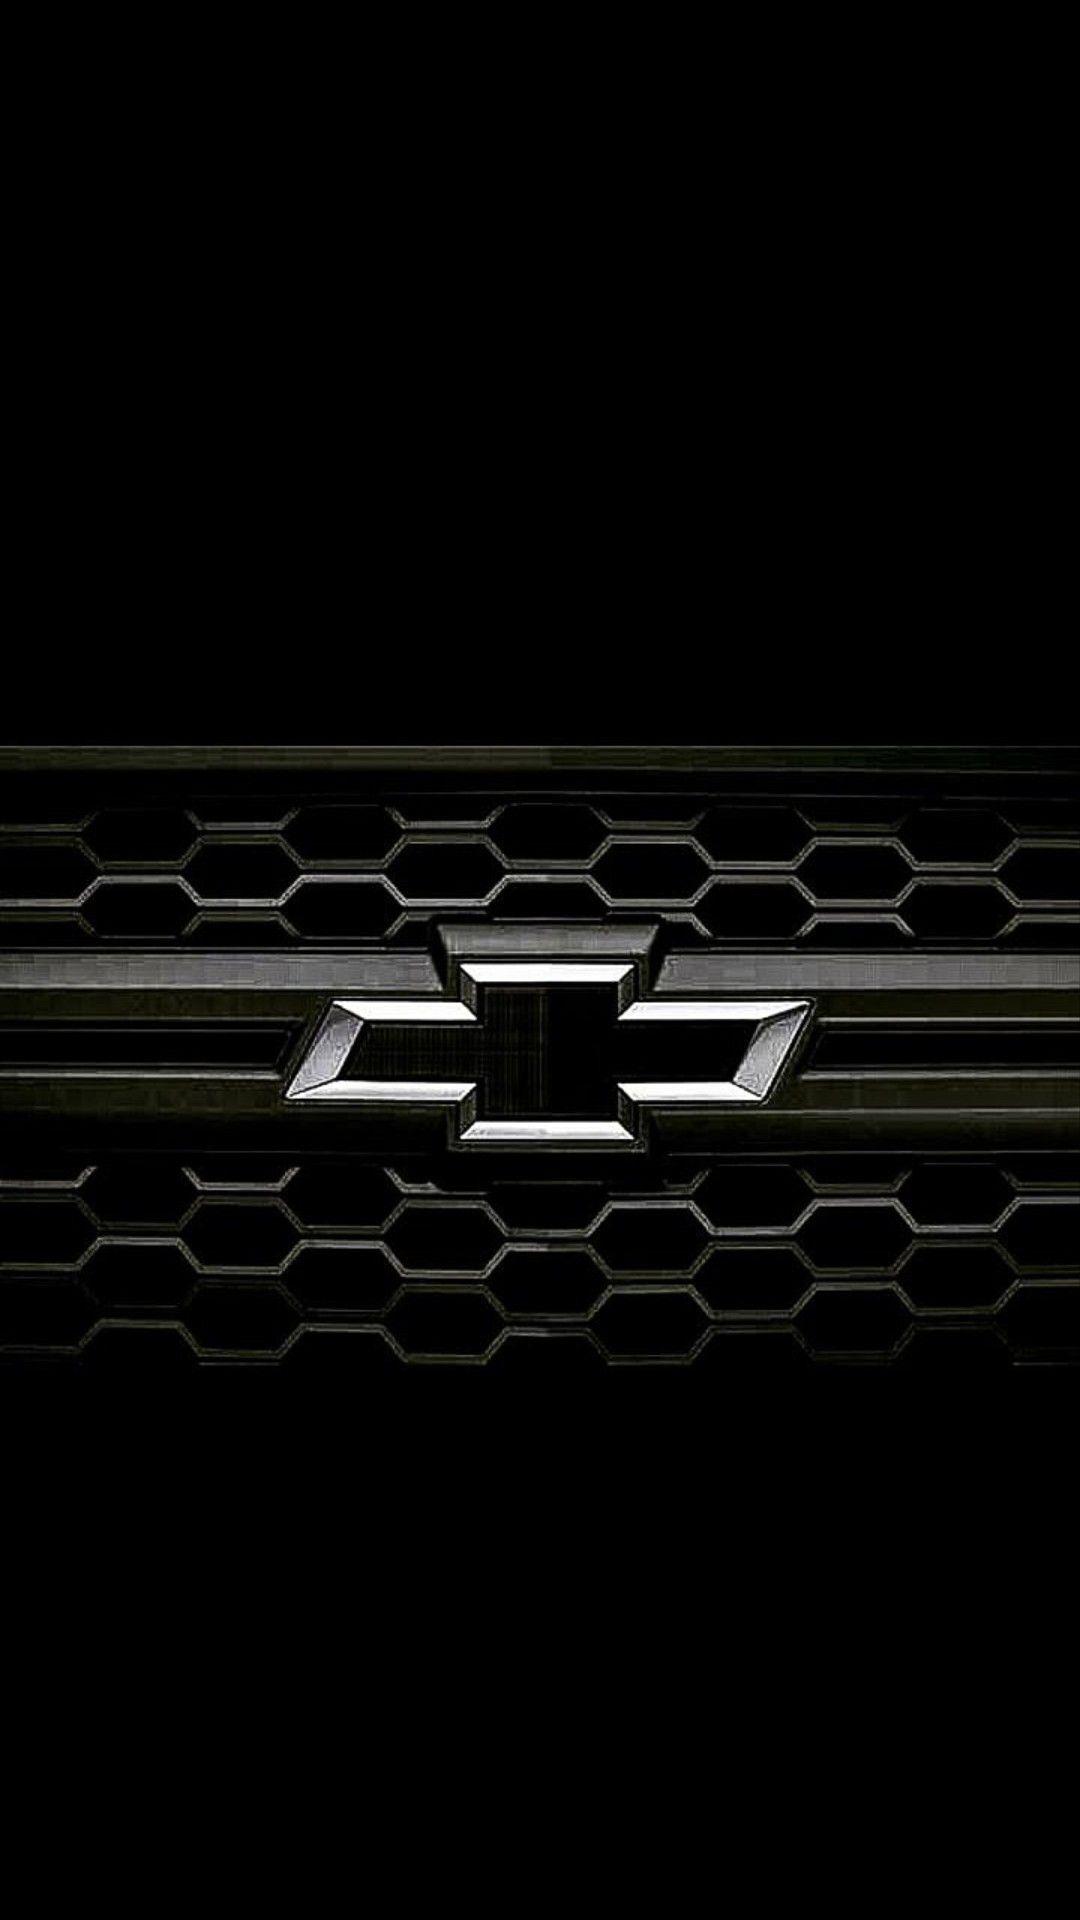 Download Camaro Logo Wallpaper Hd Backgrounds Download Itl Cat